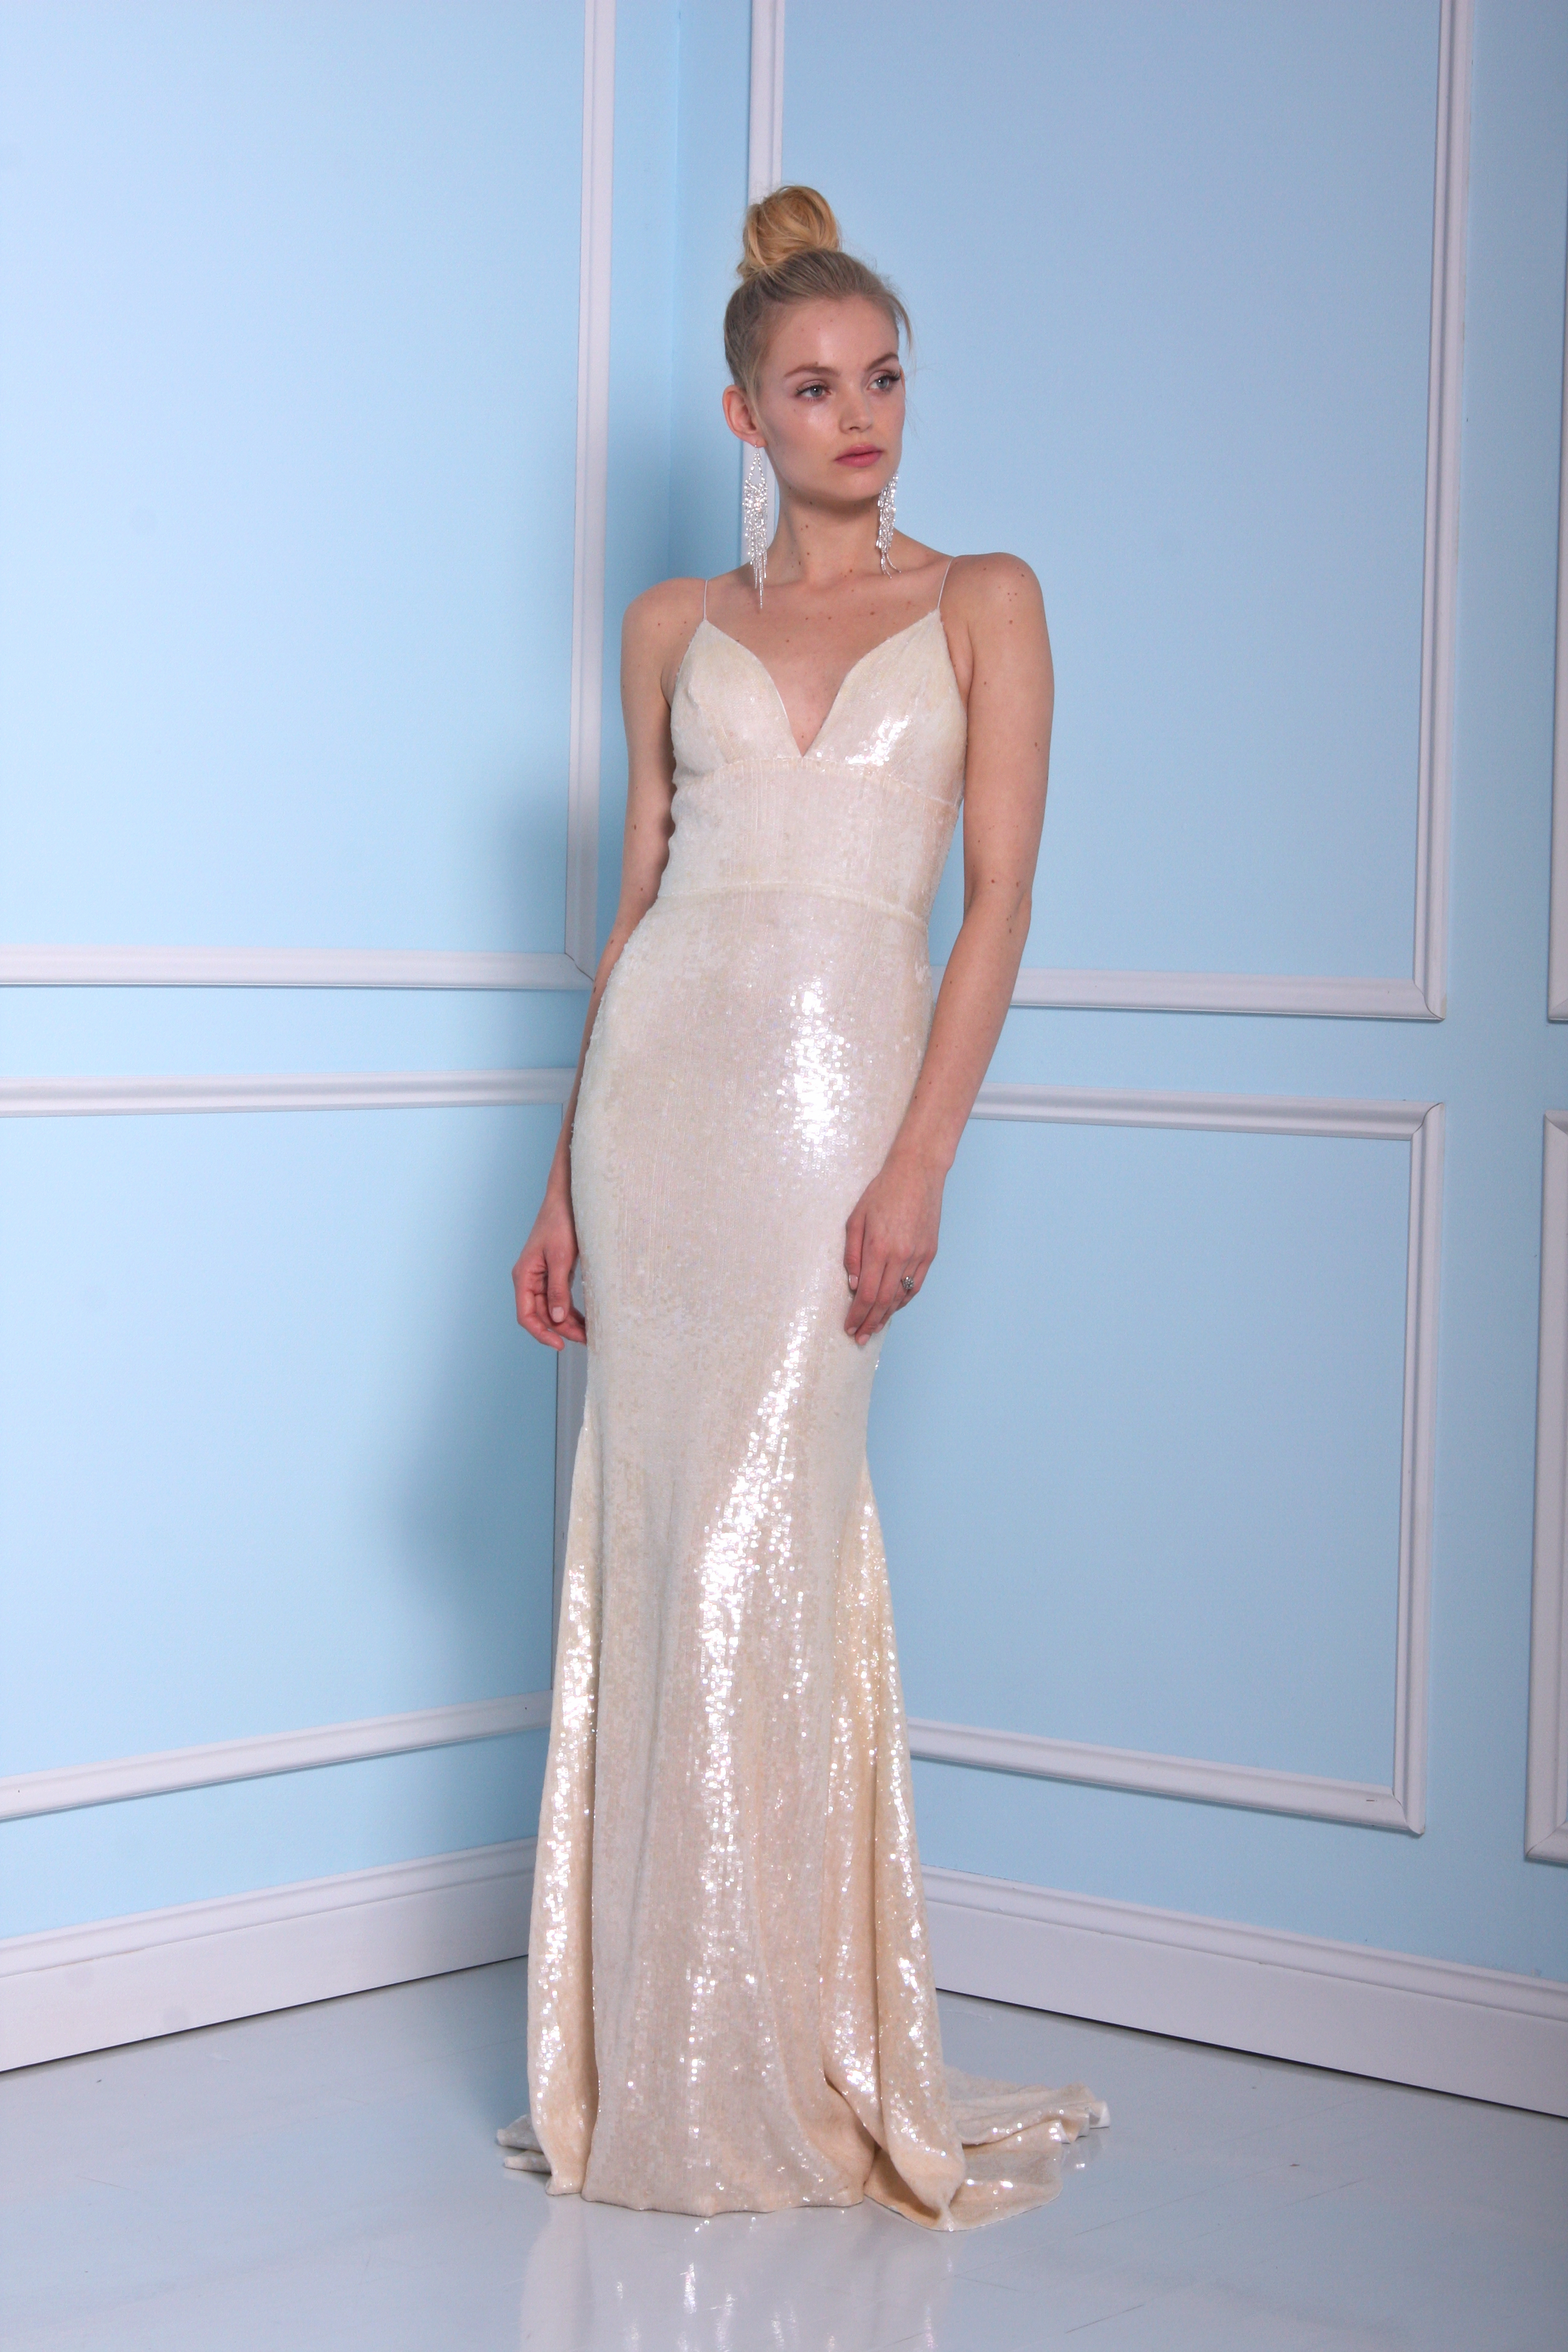 Funky Vivienne Westwood Wedding Dresses Mold - All Wedding Dresses ...